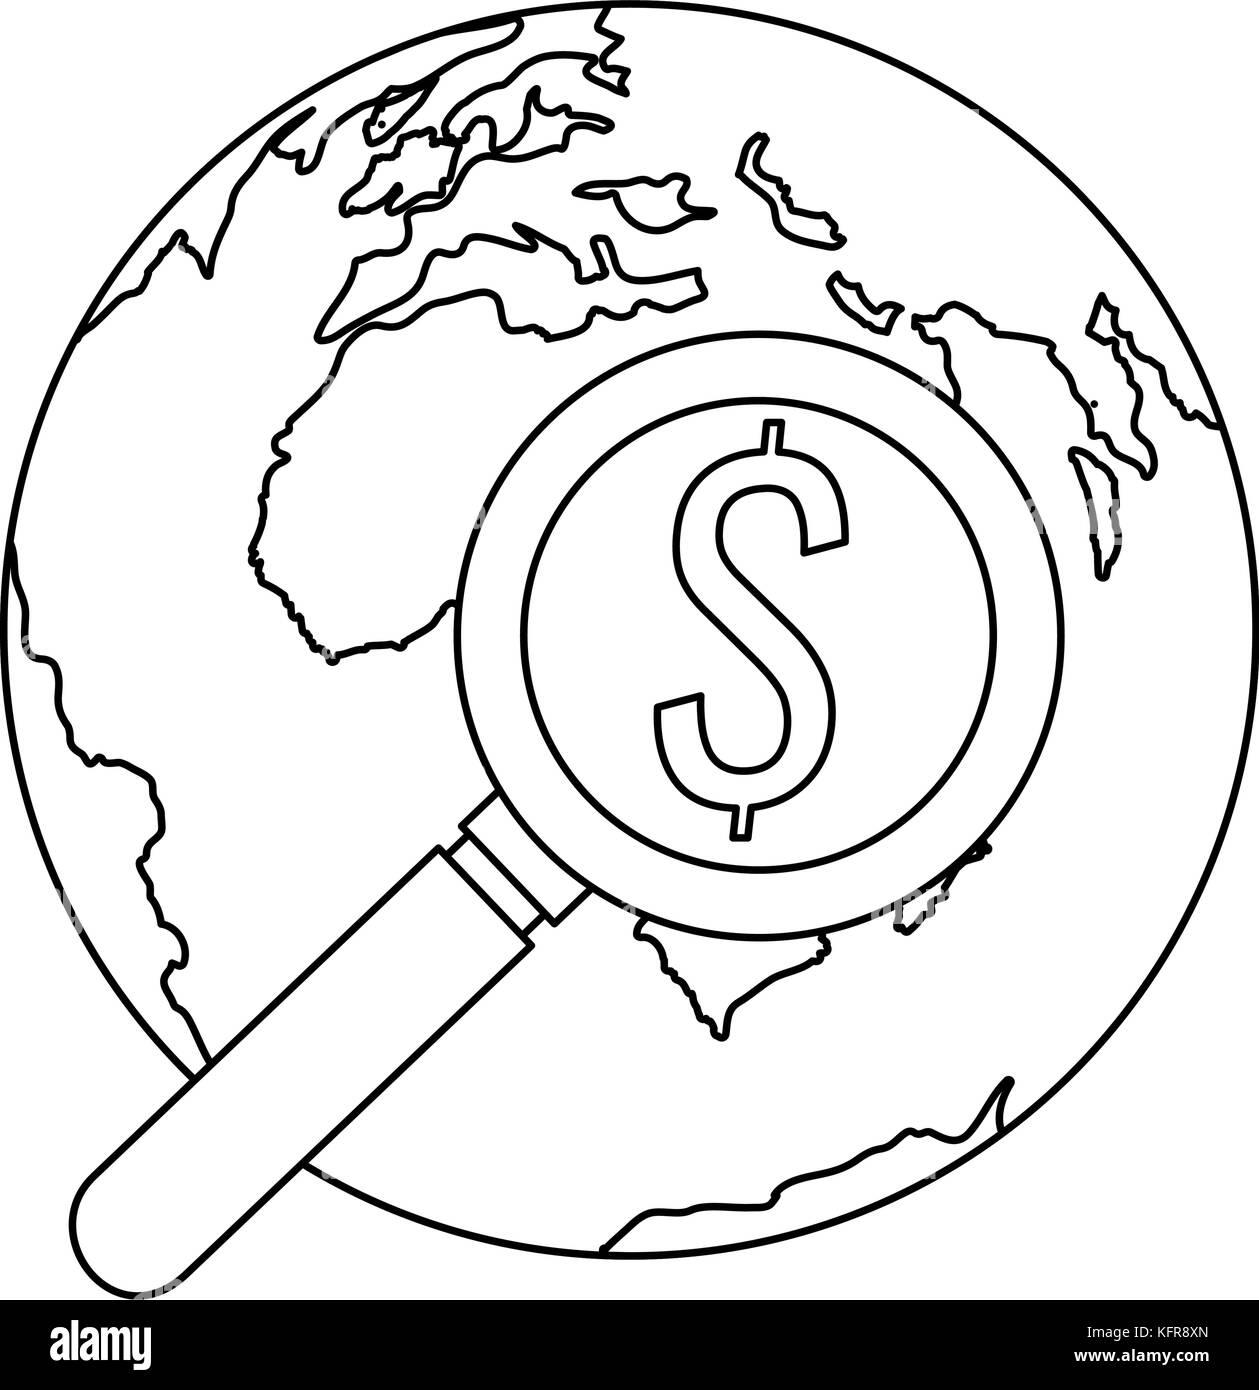 Welt der Planet Erde mit Lupe gkass Stockbild